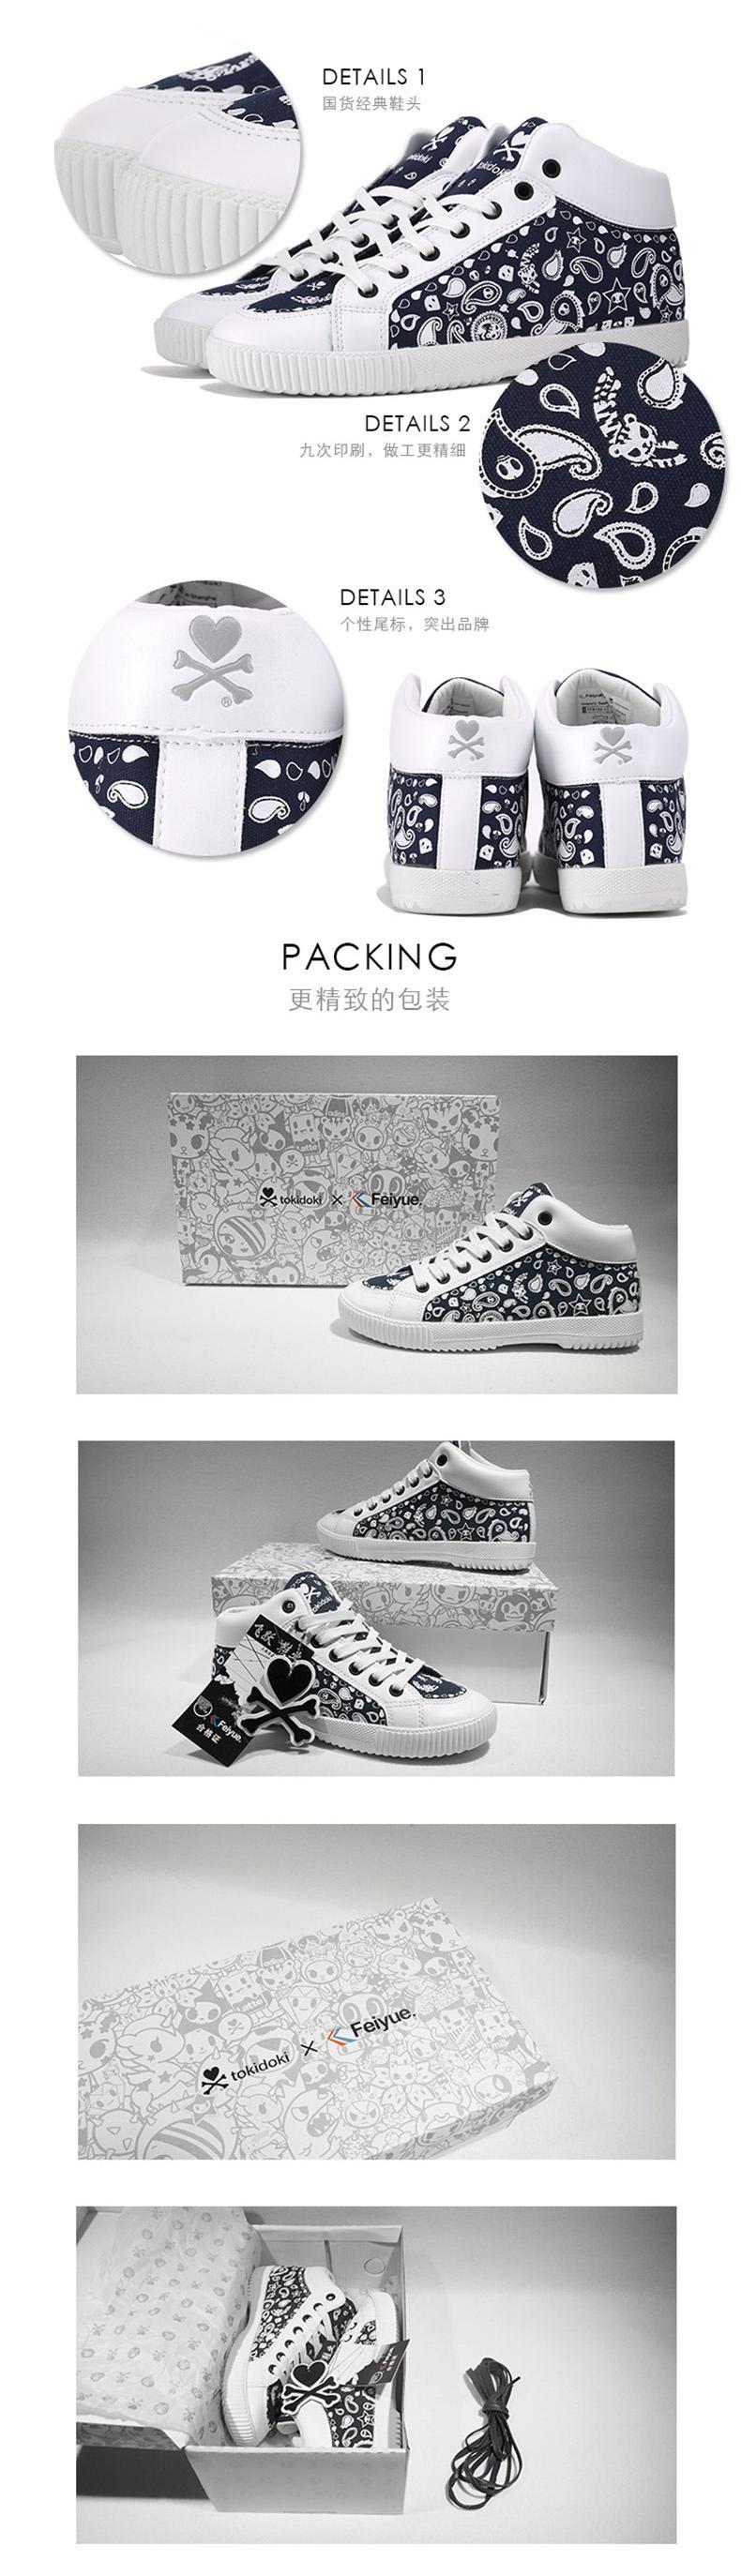 Tokidoki X Feiyue Limited High Top Fashion Sneaker